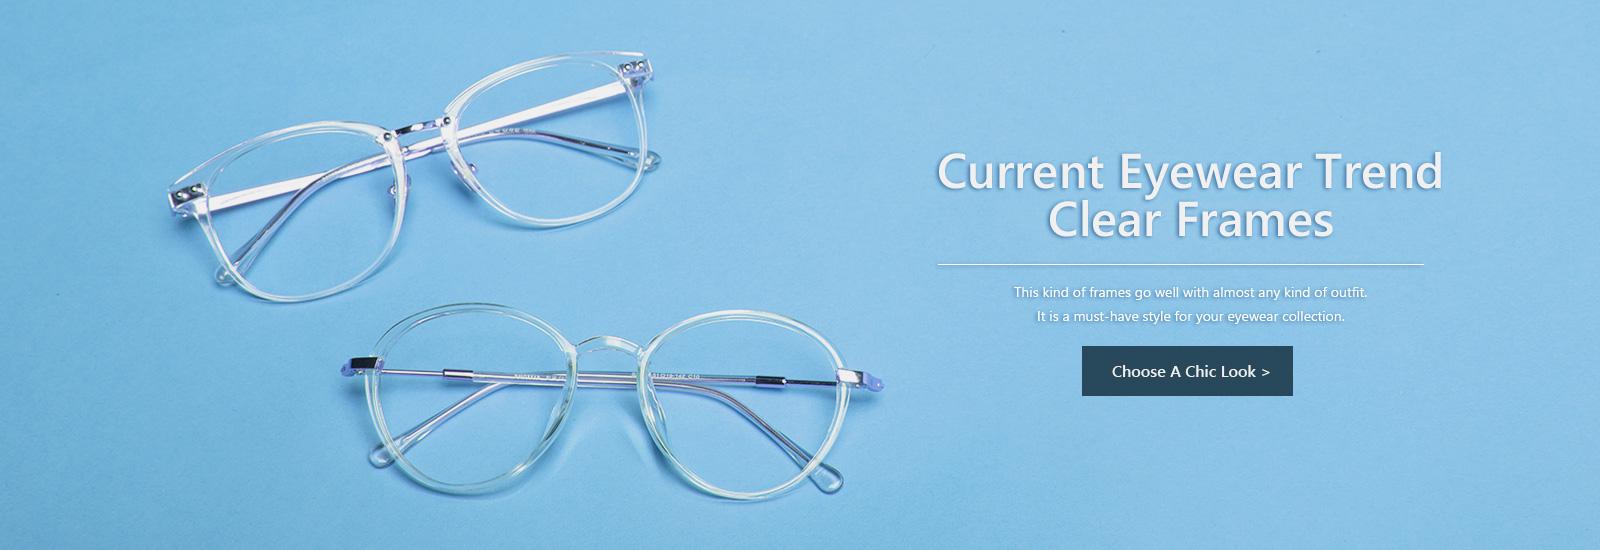 discount eyewear online alws  Buy Prescription Eyeglasses Online, Reading Glasses, Cheap Eyewear Frames   Firmoocom